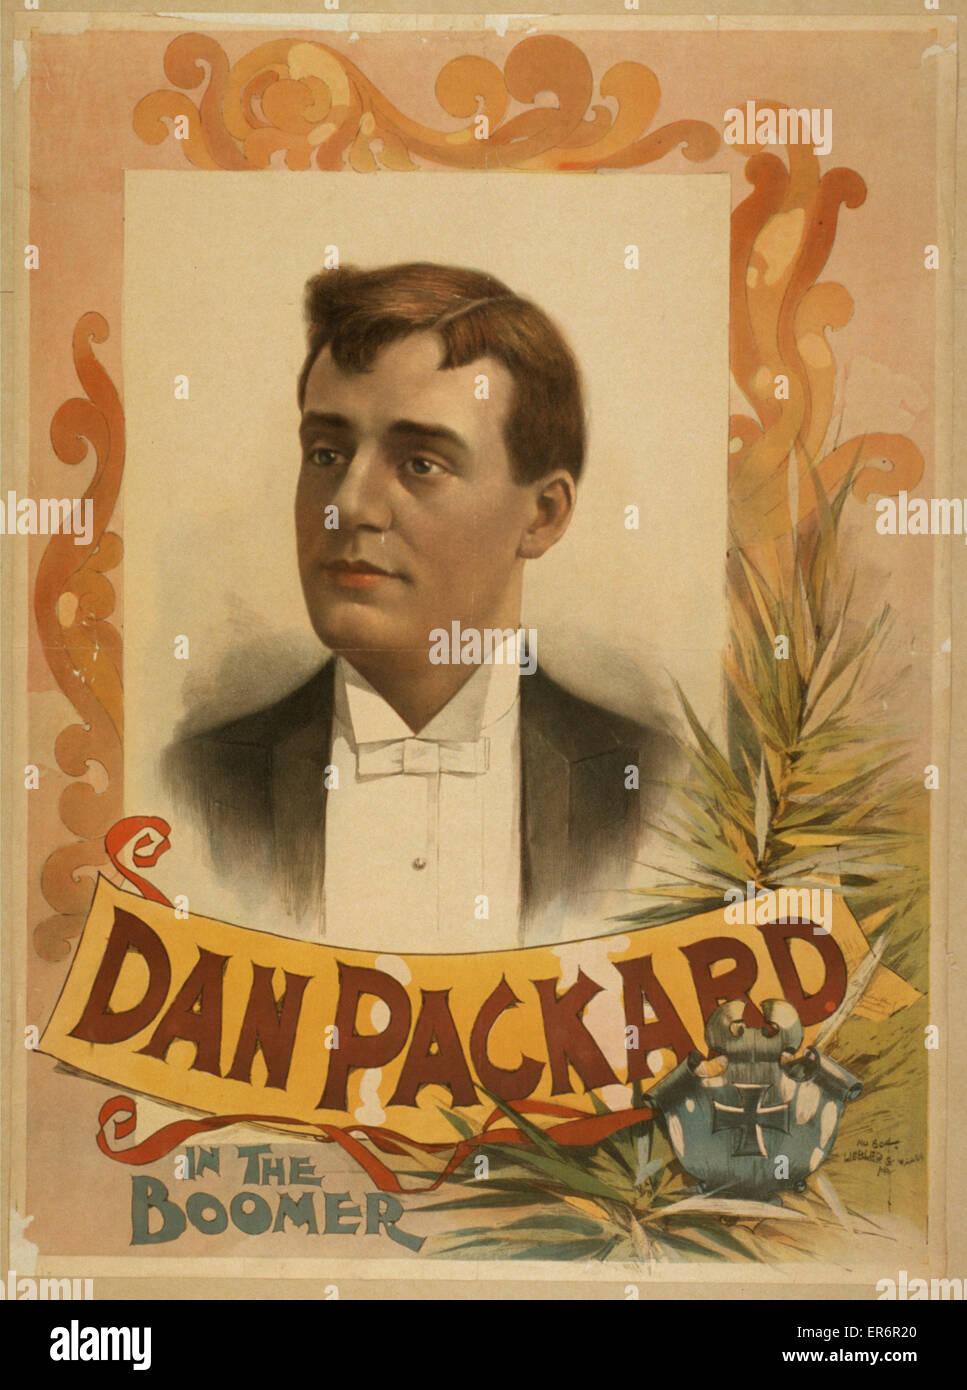 Dan Packard in The boomer. Date 189-?. - Stock Image